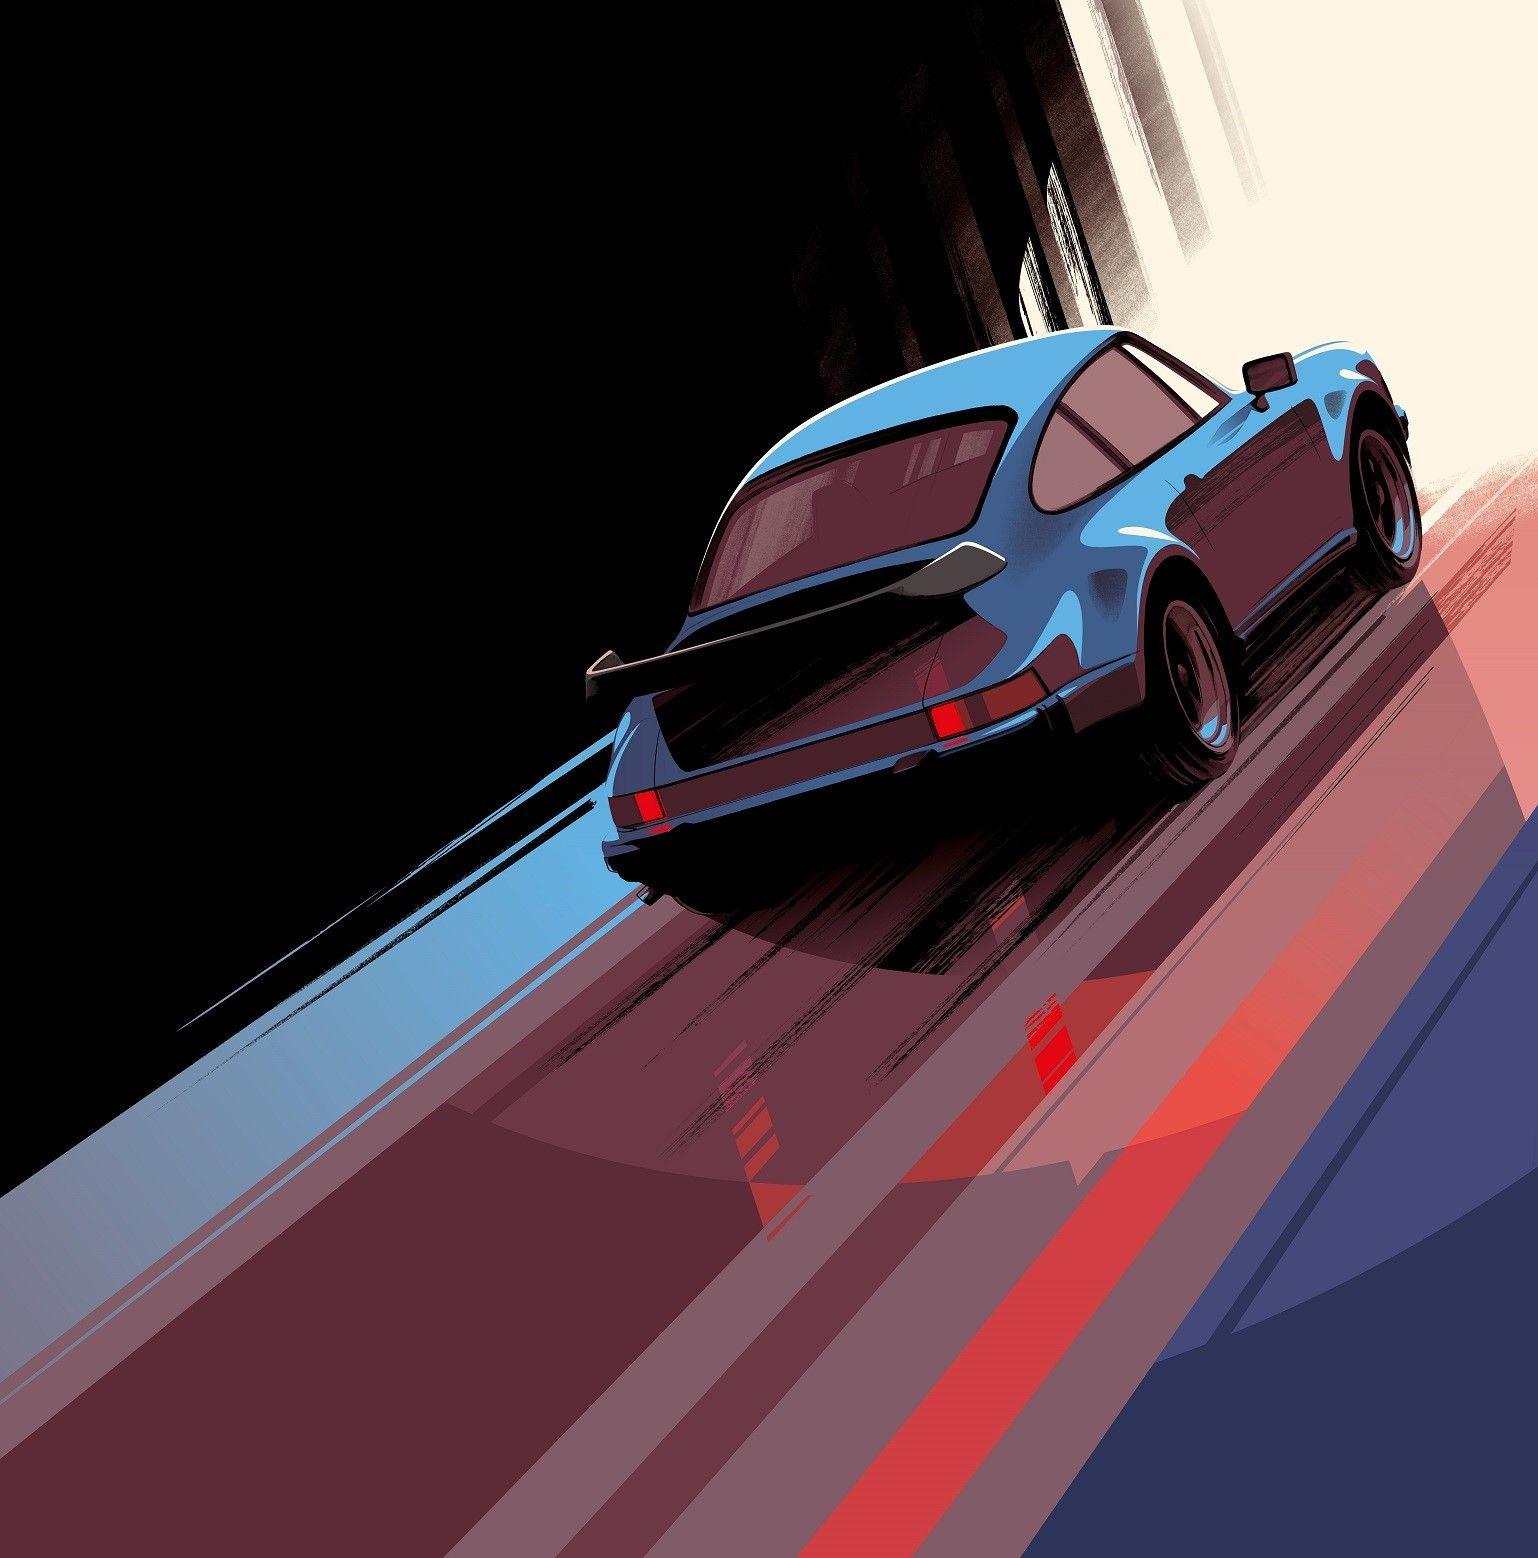 582047_Petersen_Porsche